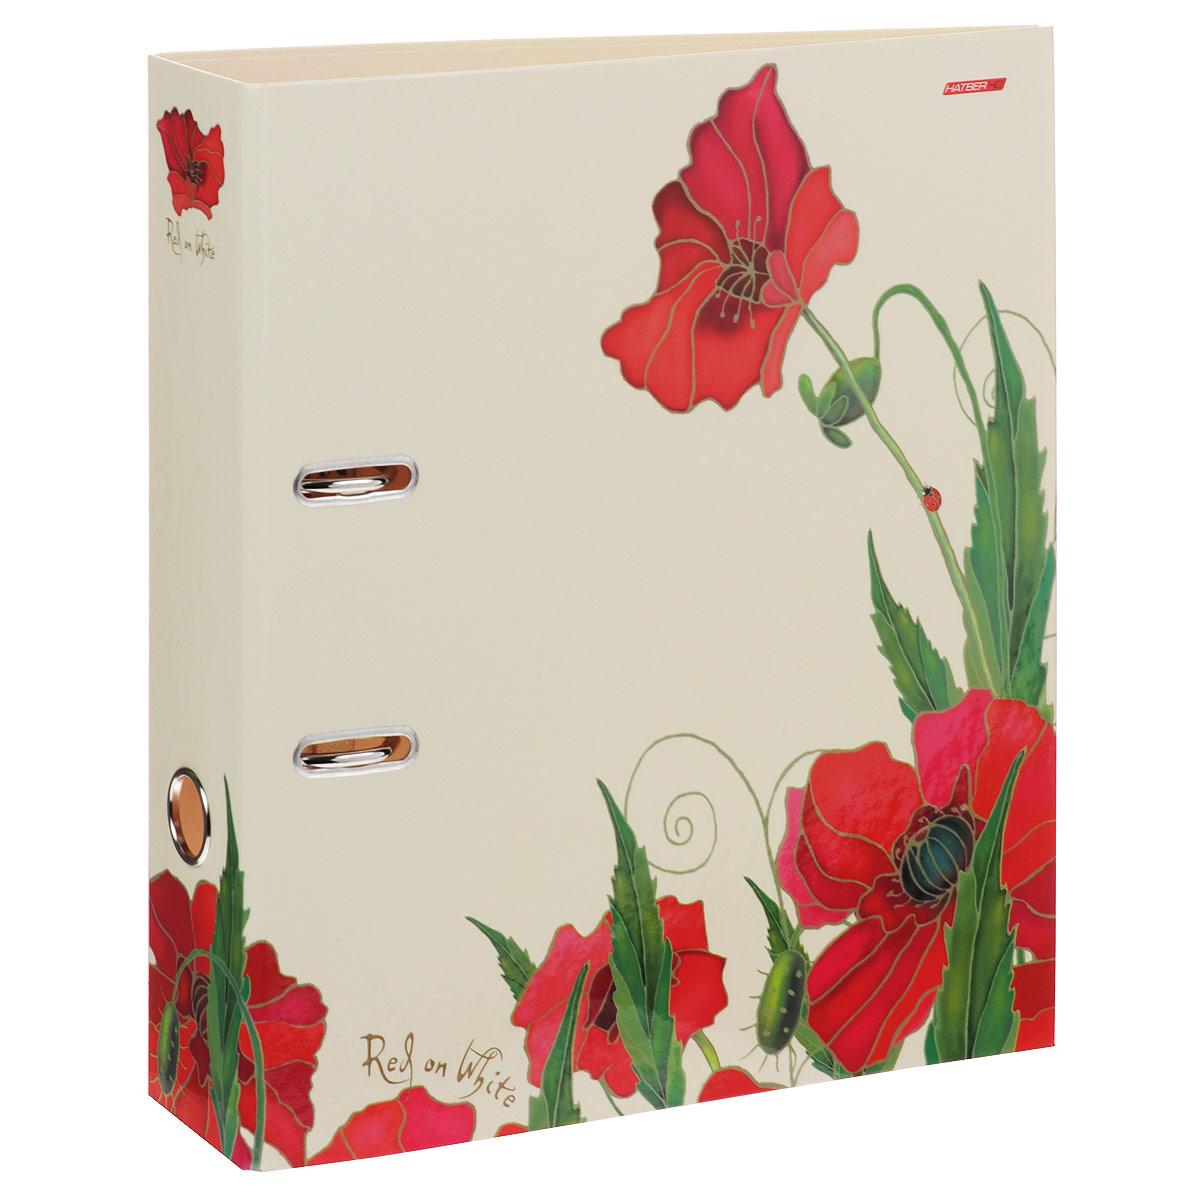 Папка-регистратор Hatber  Red on White , цвет: бежевый, красный, ширина корешка 70 мм -  Папки